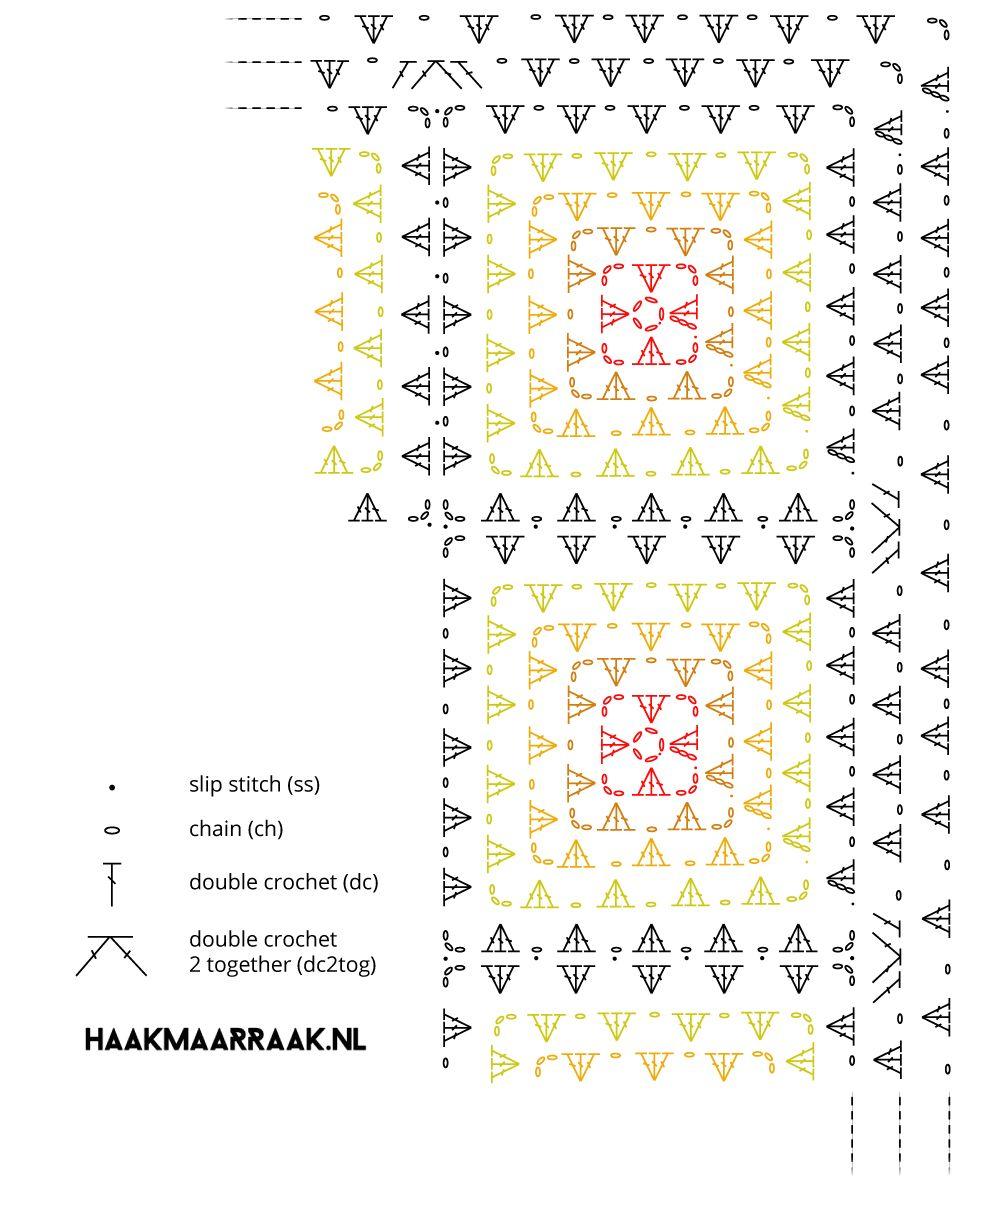 Free crochet pattern: Colourful rainbow granny square blanket ...